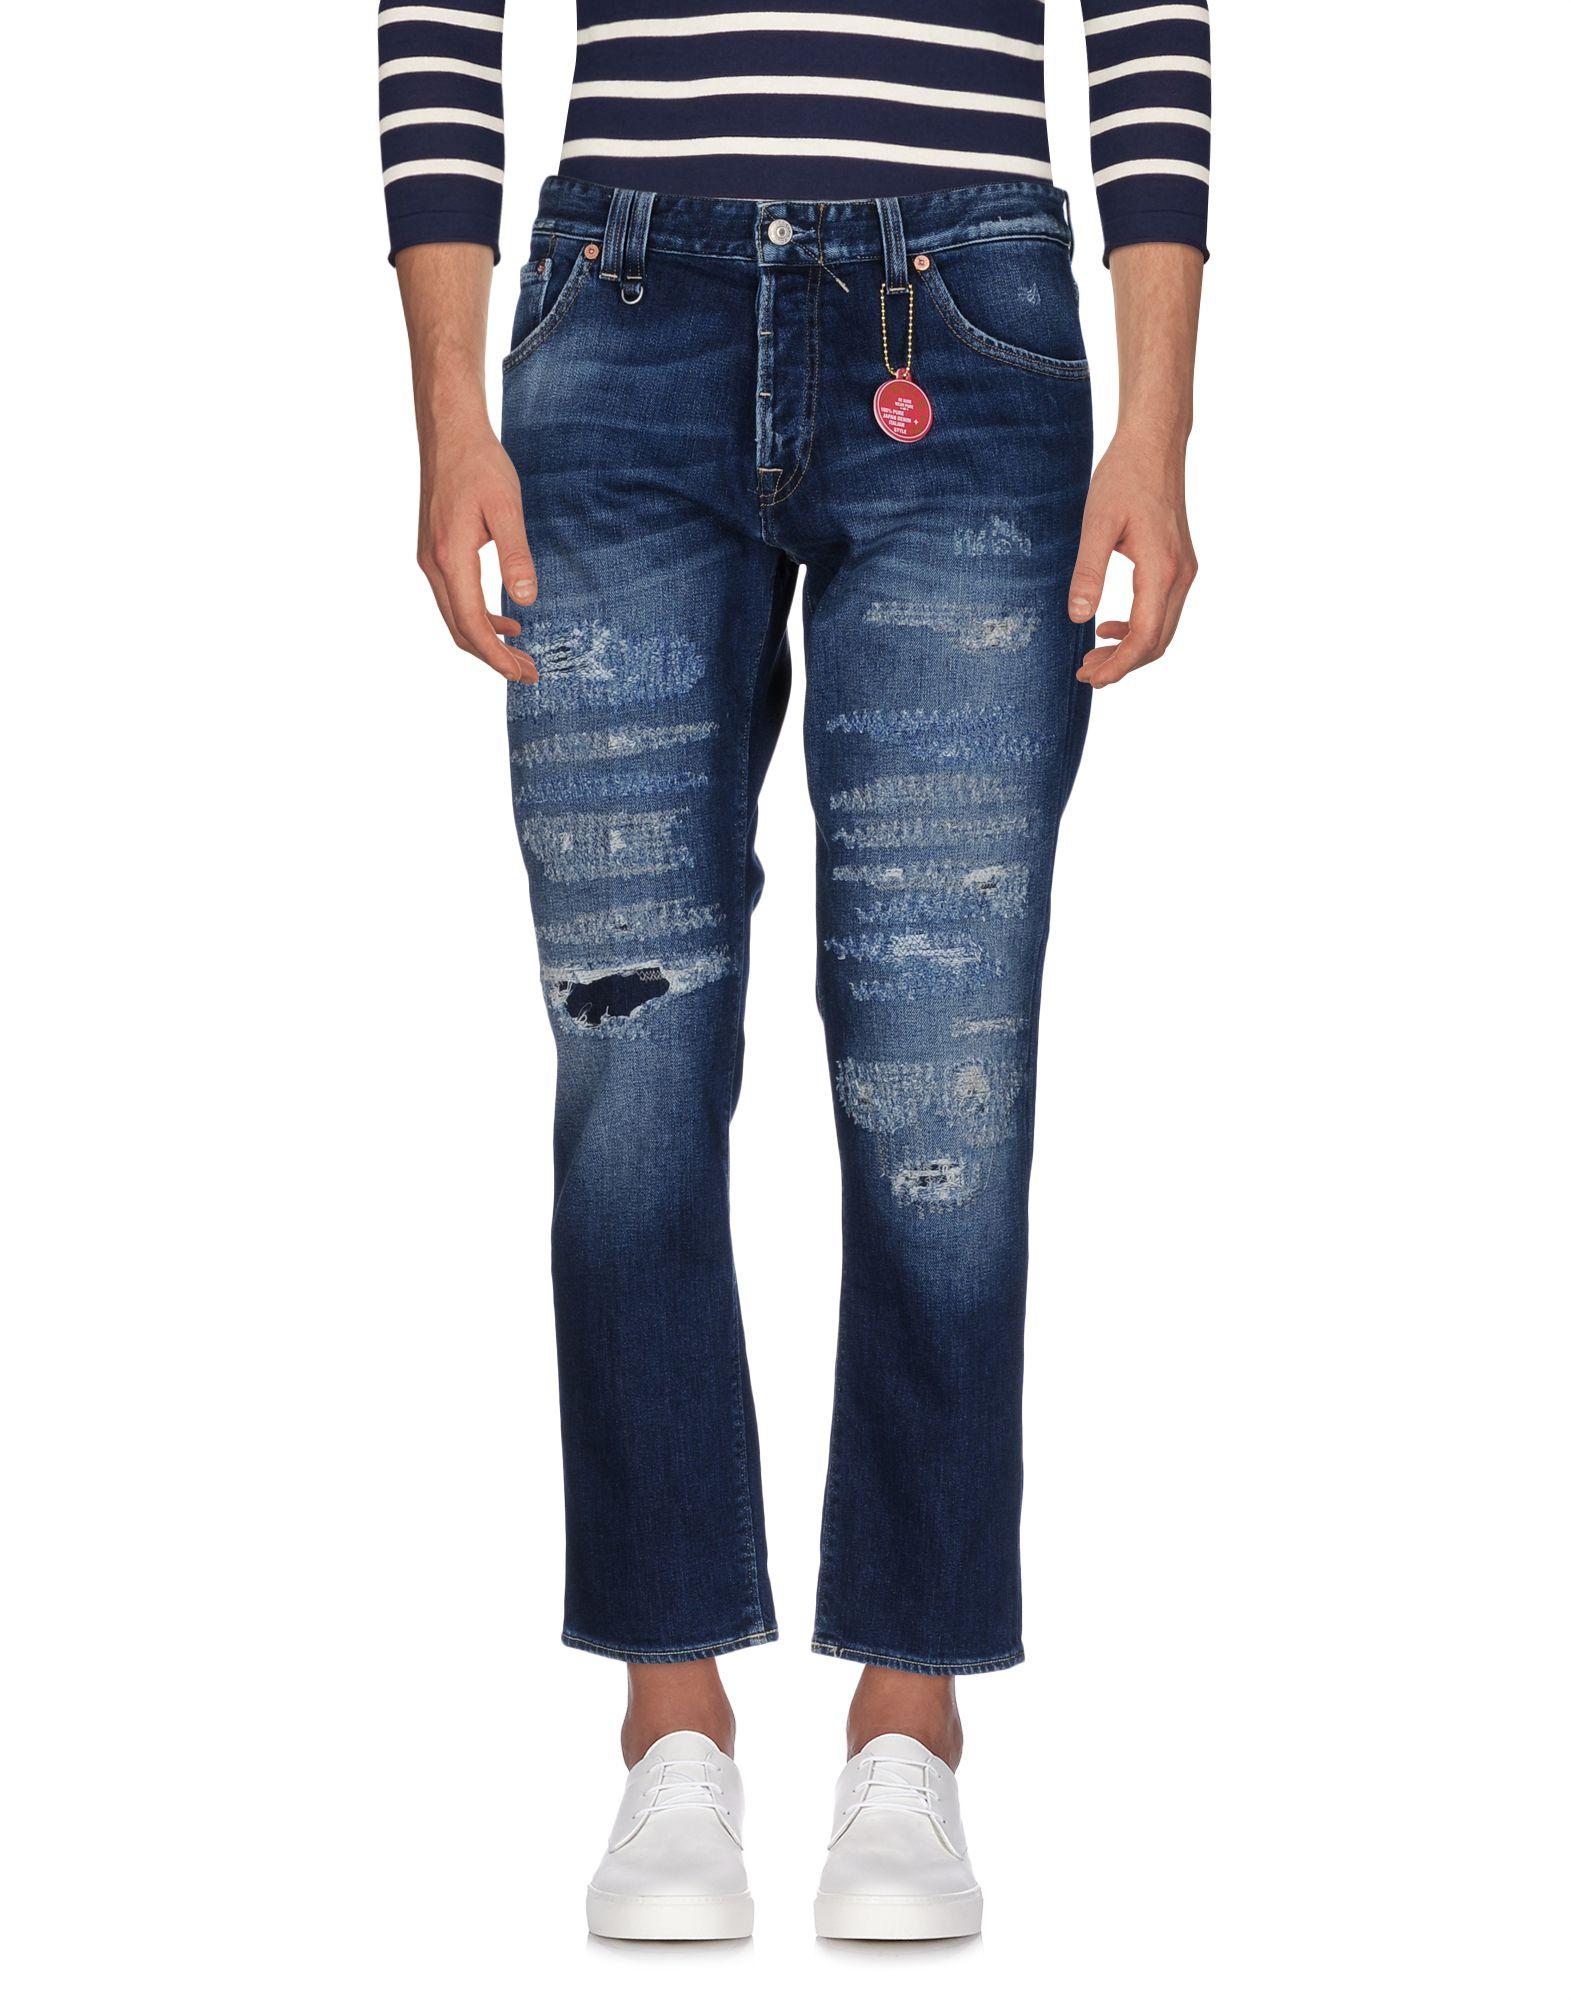 Pantaloni Jeans Cycle Uomo - Acquista online su